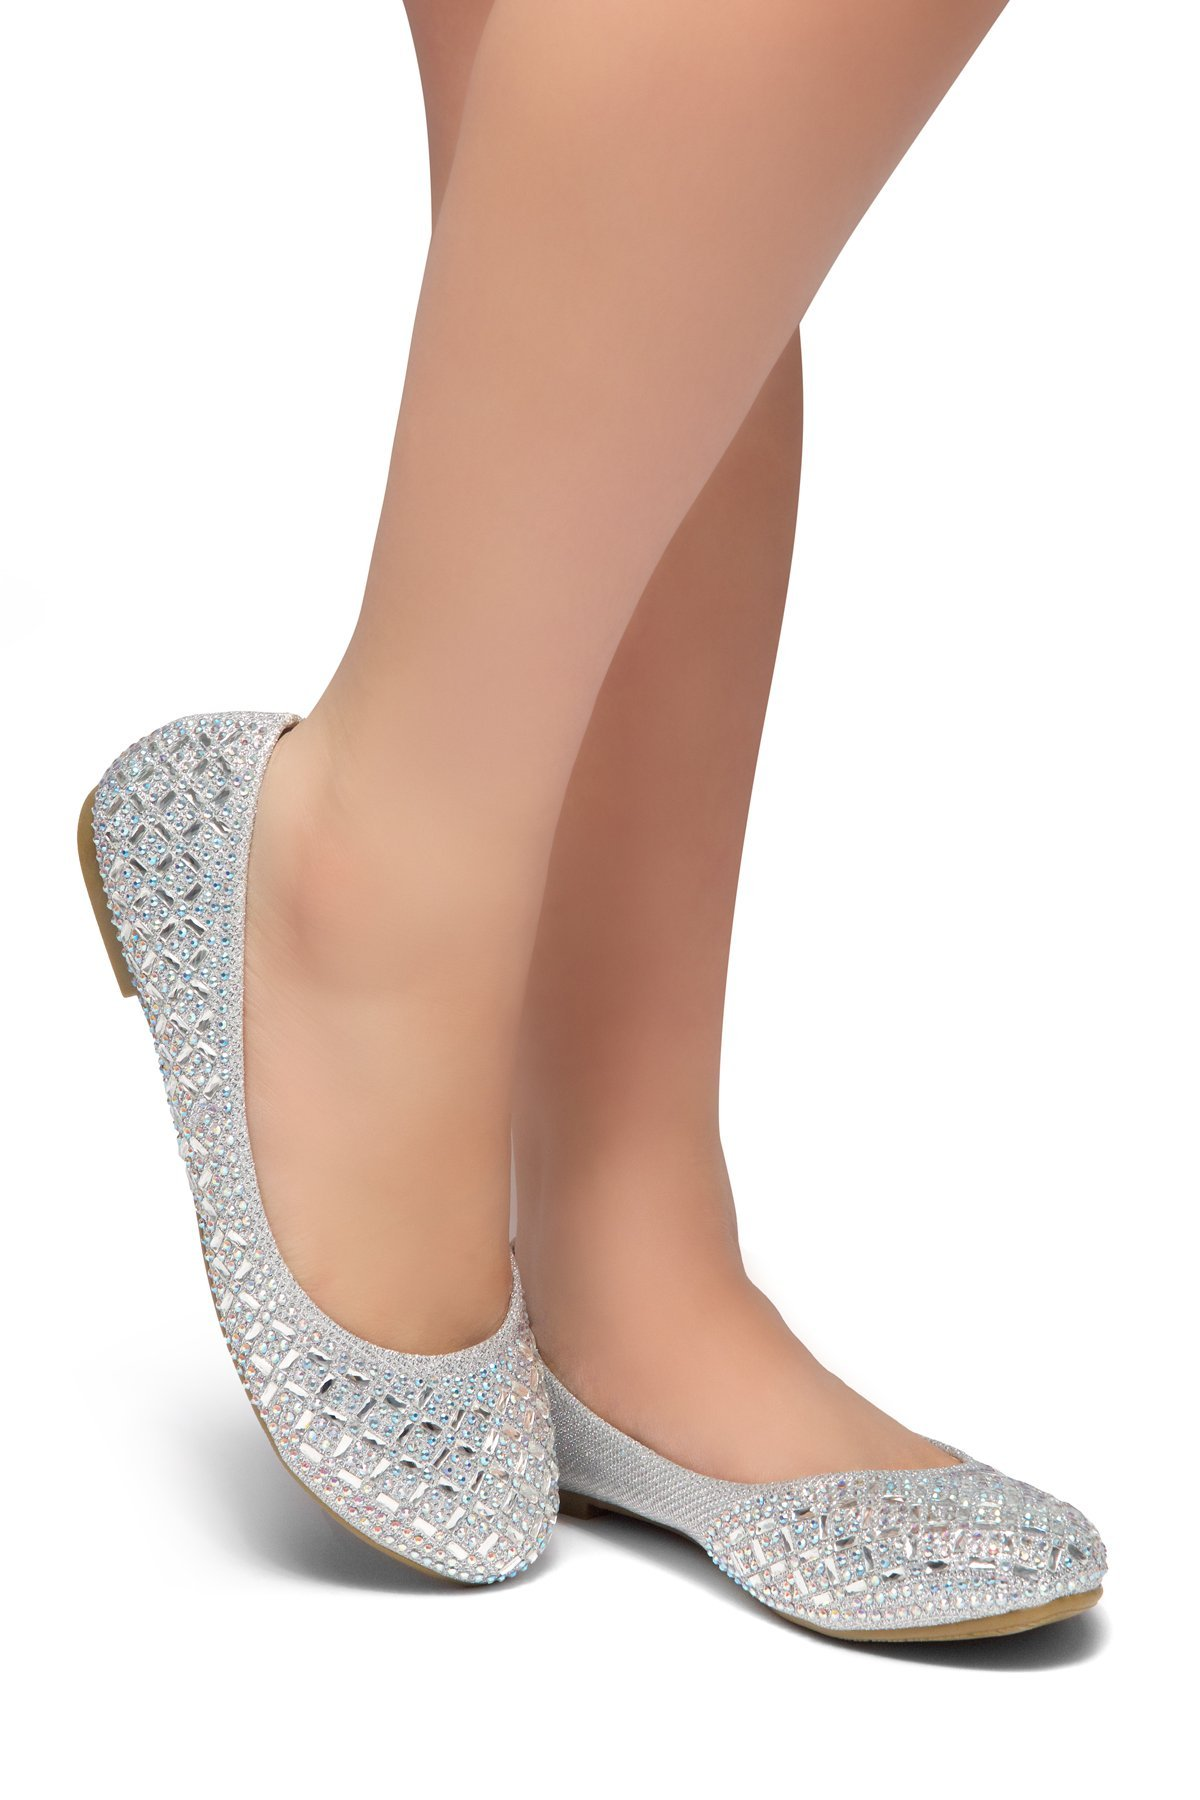 Herstyle Women's Shine Bright Round Toe, Jeweled Embellishments Silver 8